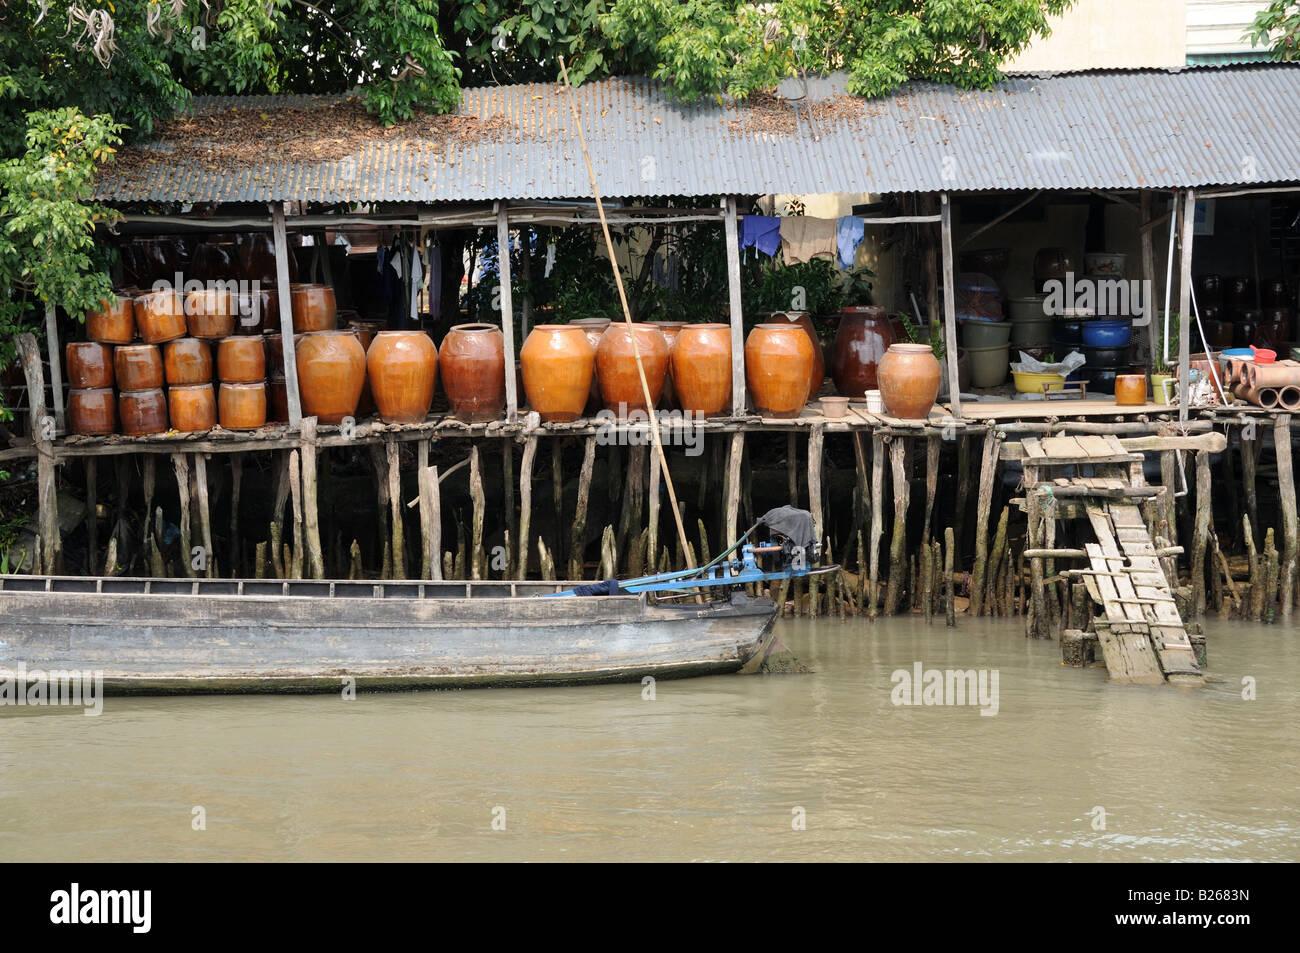 Stilt House Vietnam Stock Photos & Stilt House Vietnam Stock Images